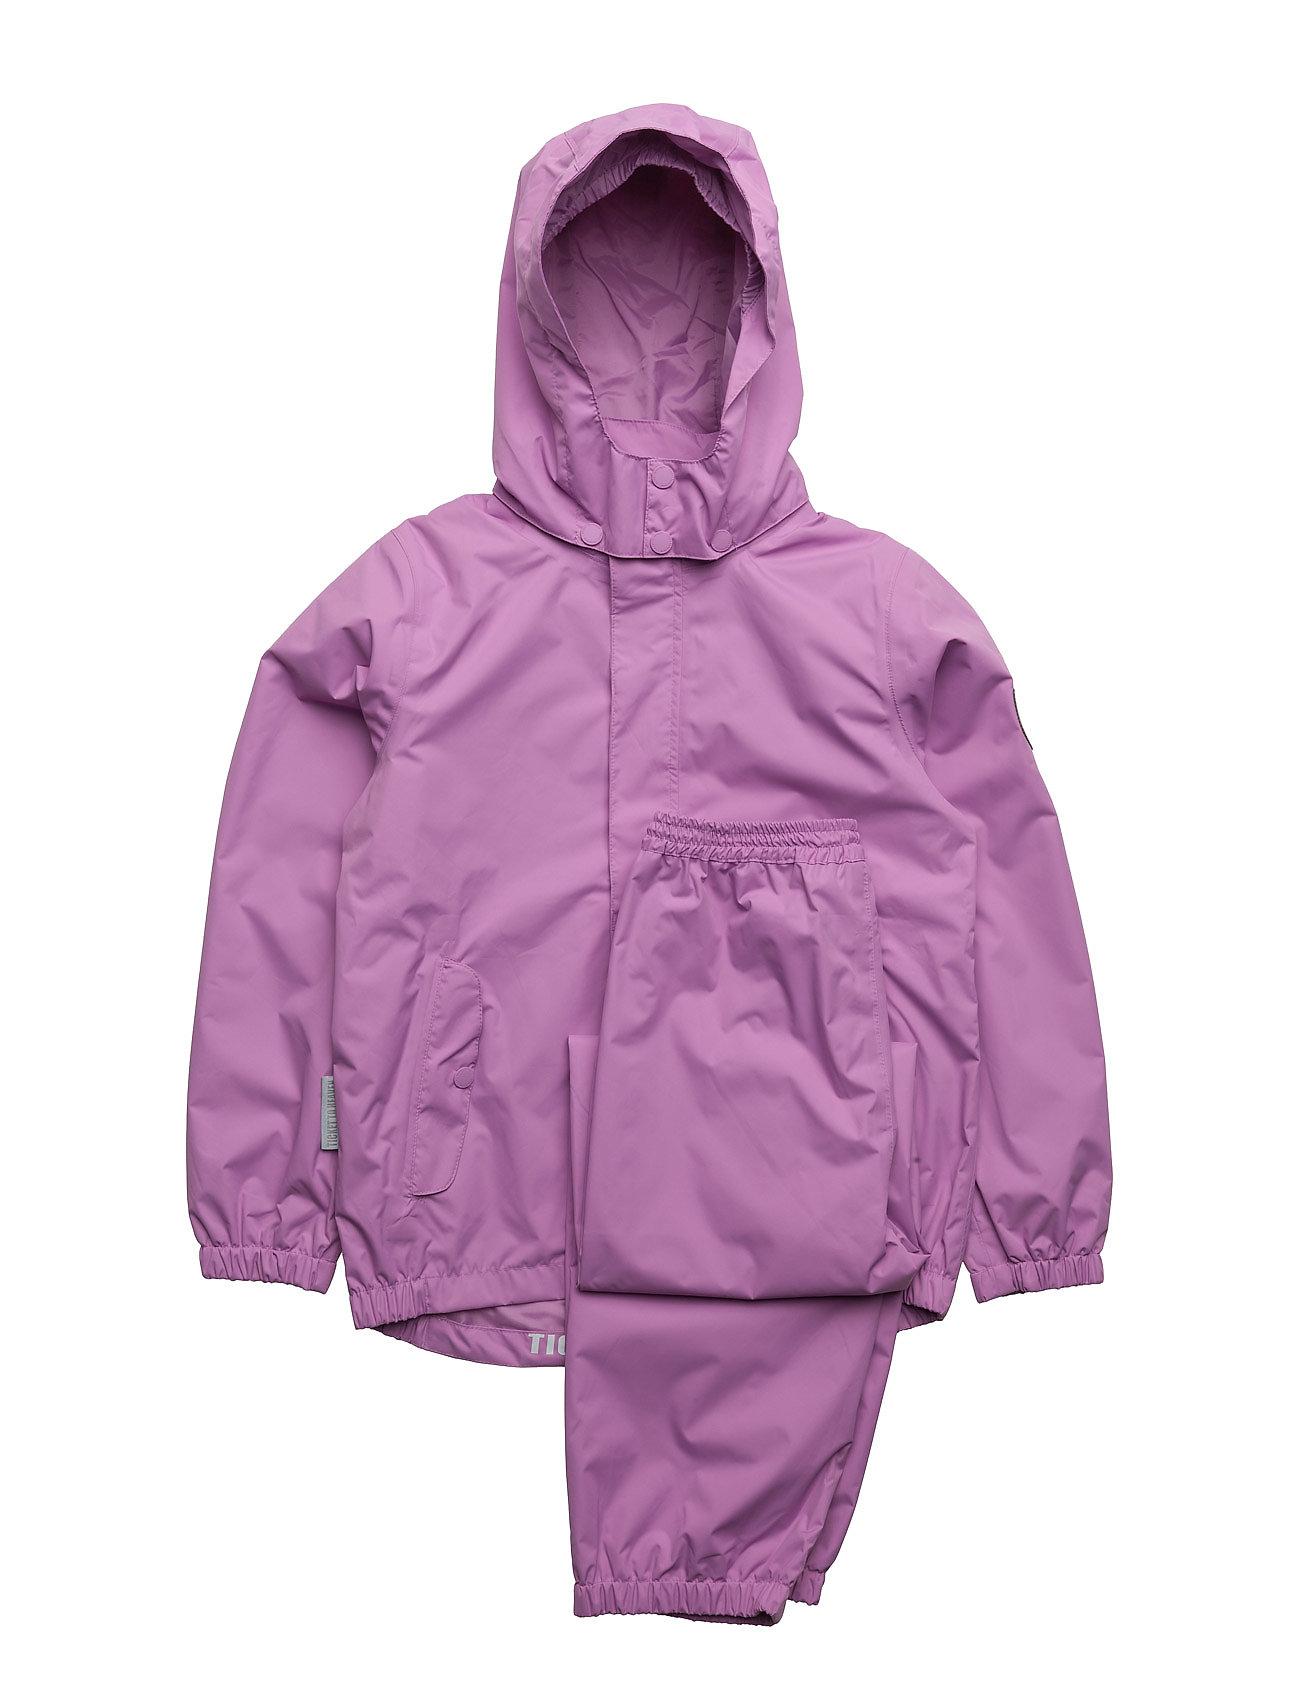 Rain Set 2pcs Plain With Detachable Hood Ticket to Heaven Fleece